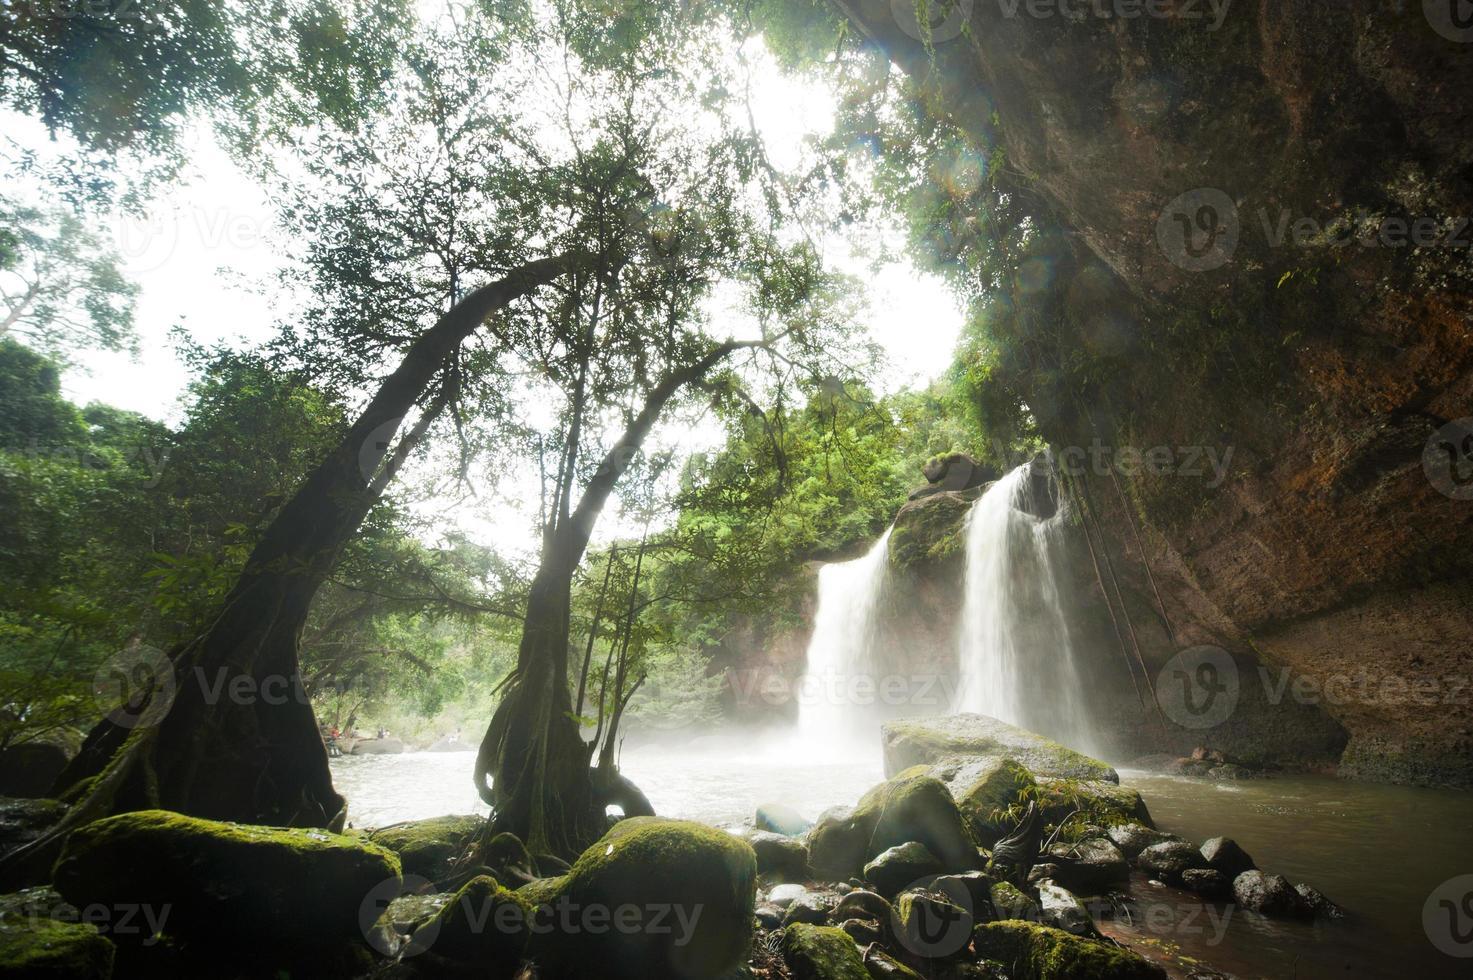 haew suwat wasserfall im khao yai nationalpark, thailand. foto